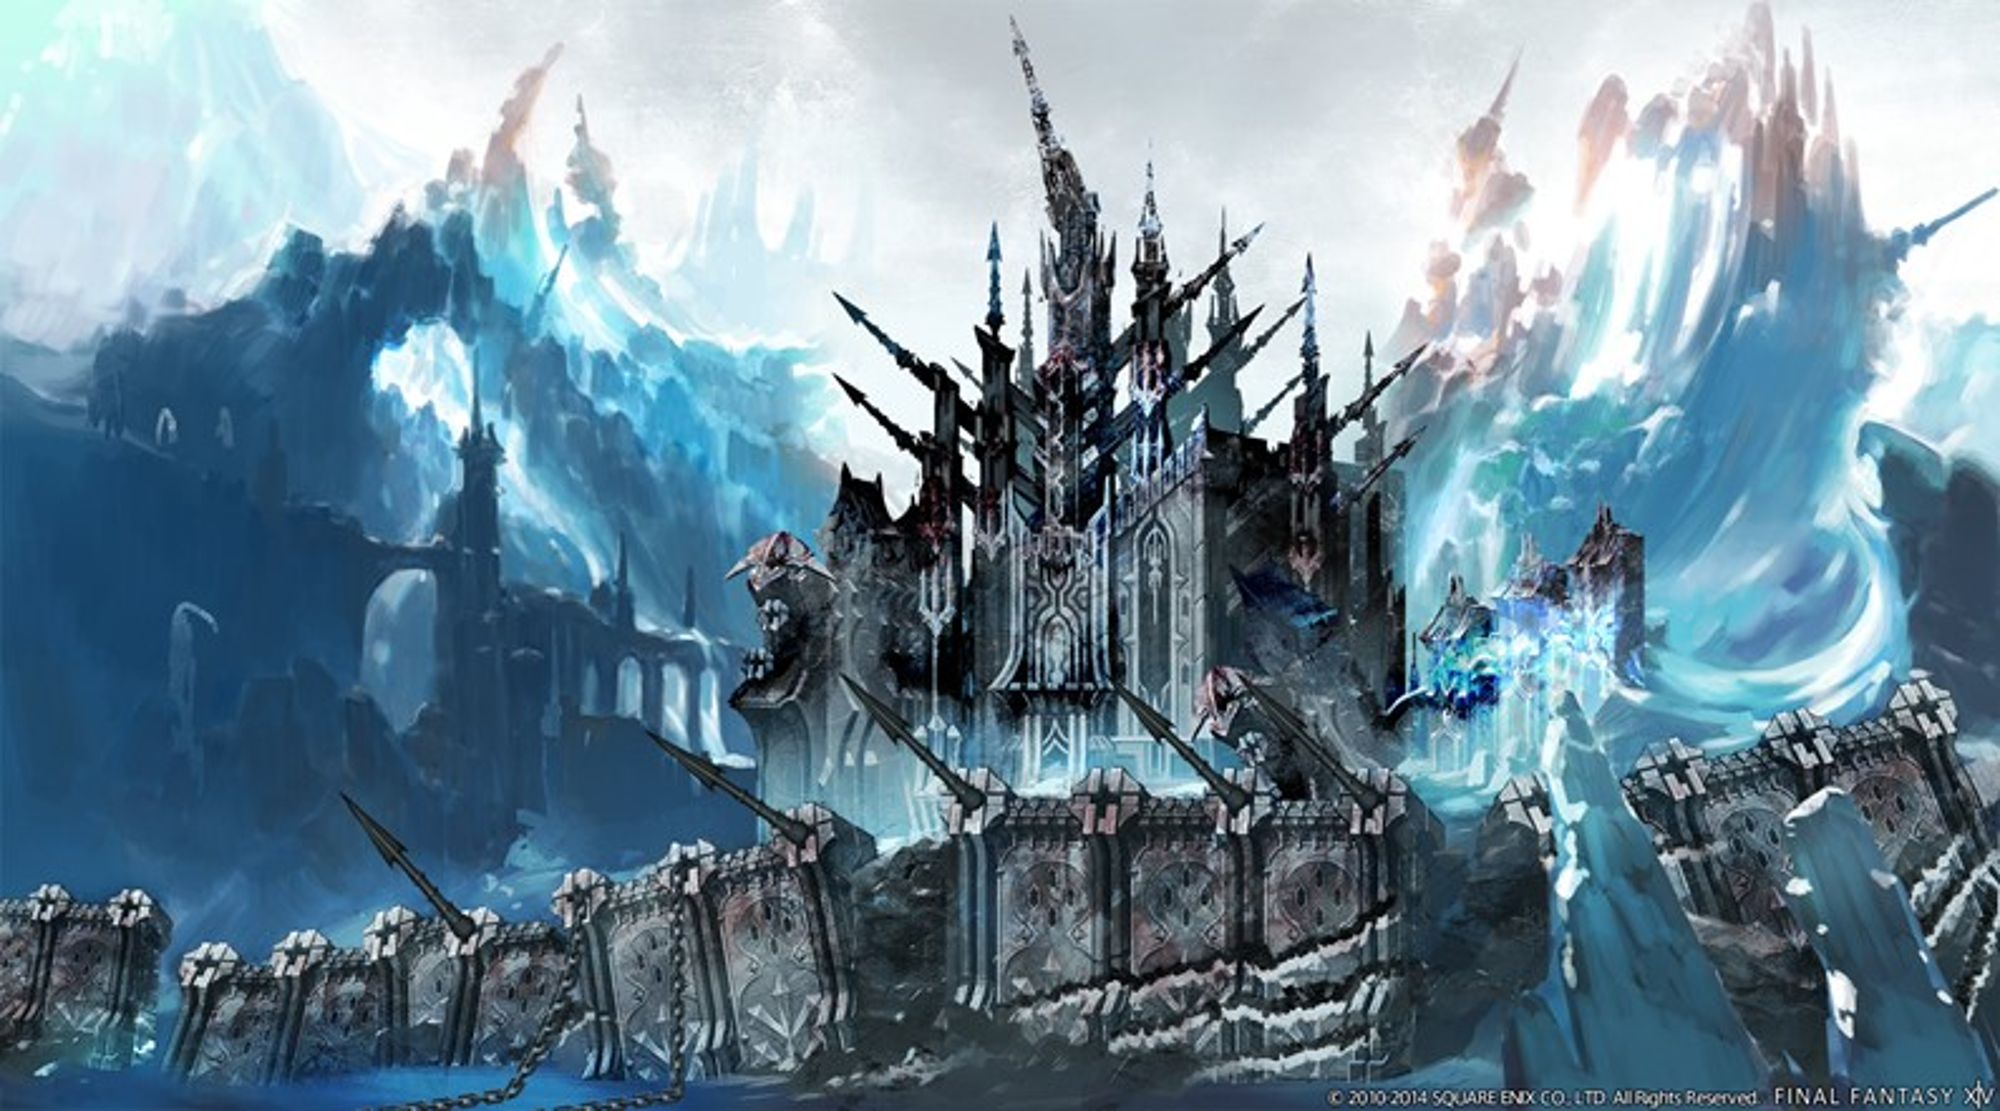 Final Fantasy XIV: Heavensward - Screens e artes dos ambientes